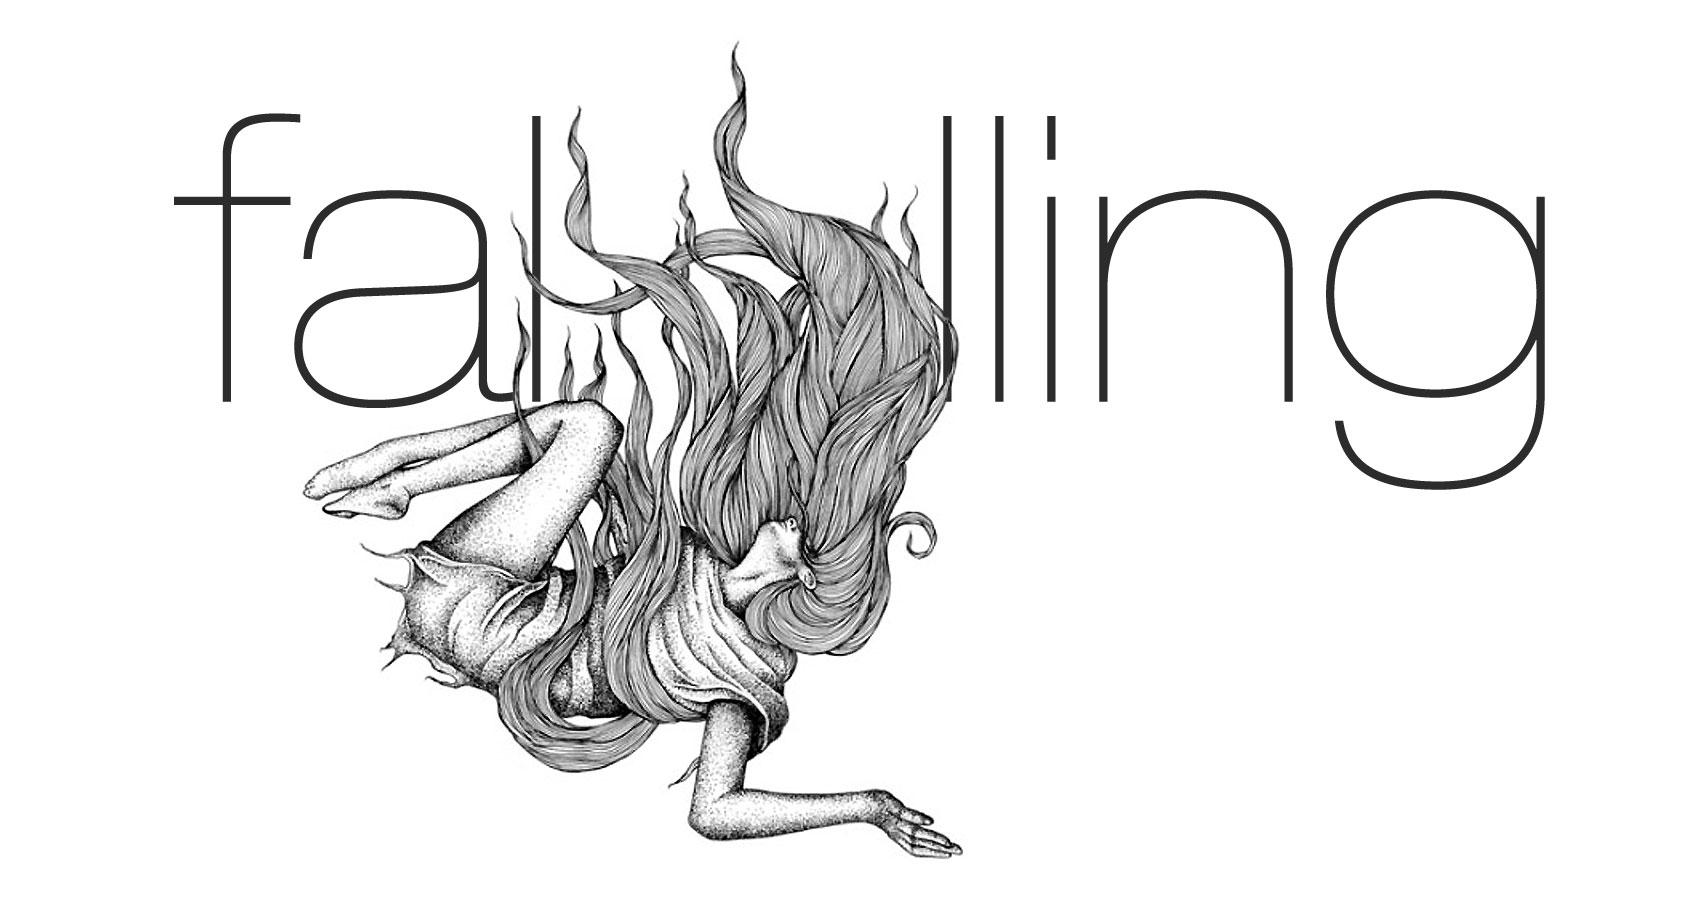 Falling written by Anushka Maheshwary at Spillword.com